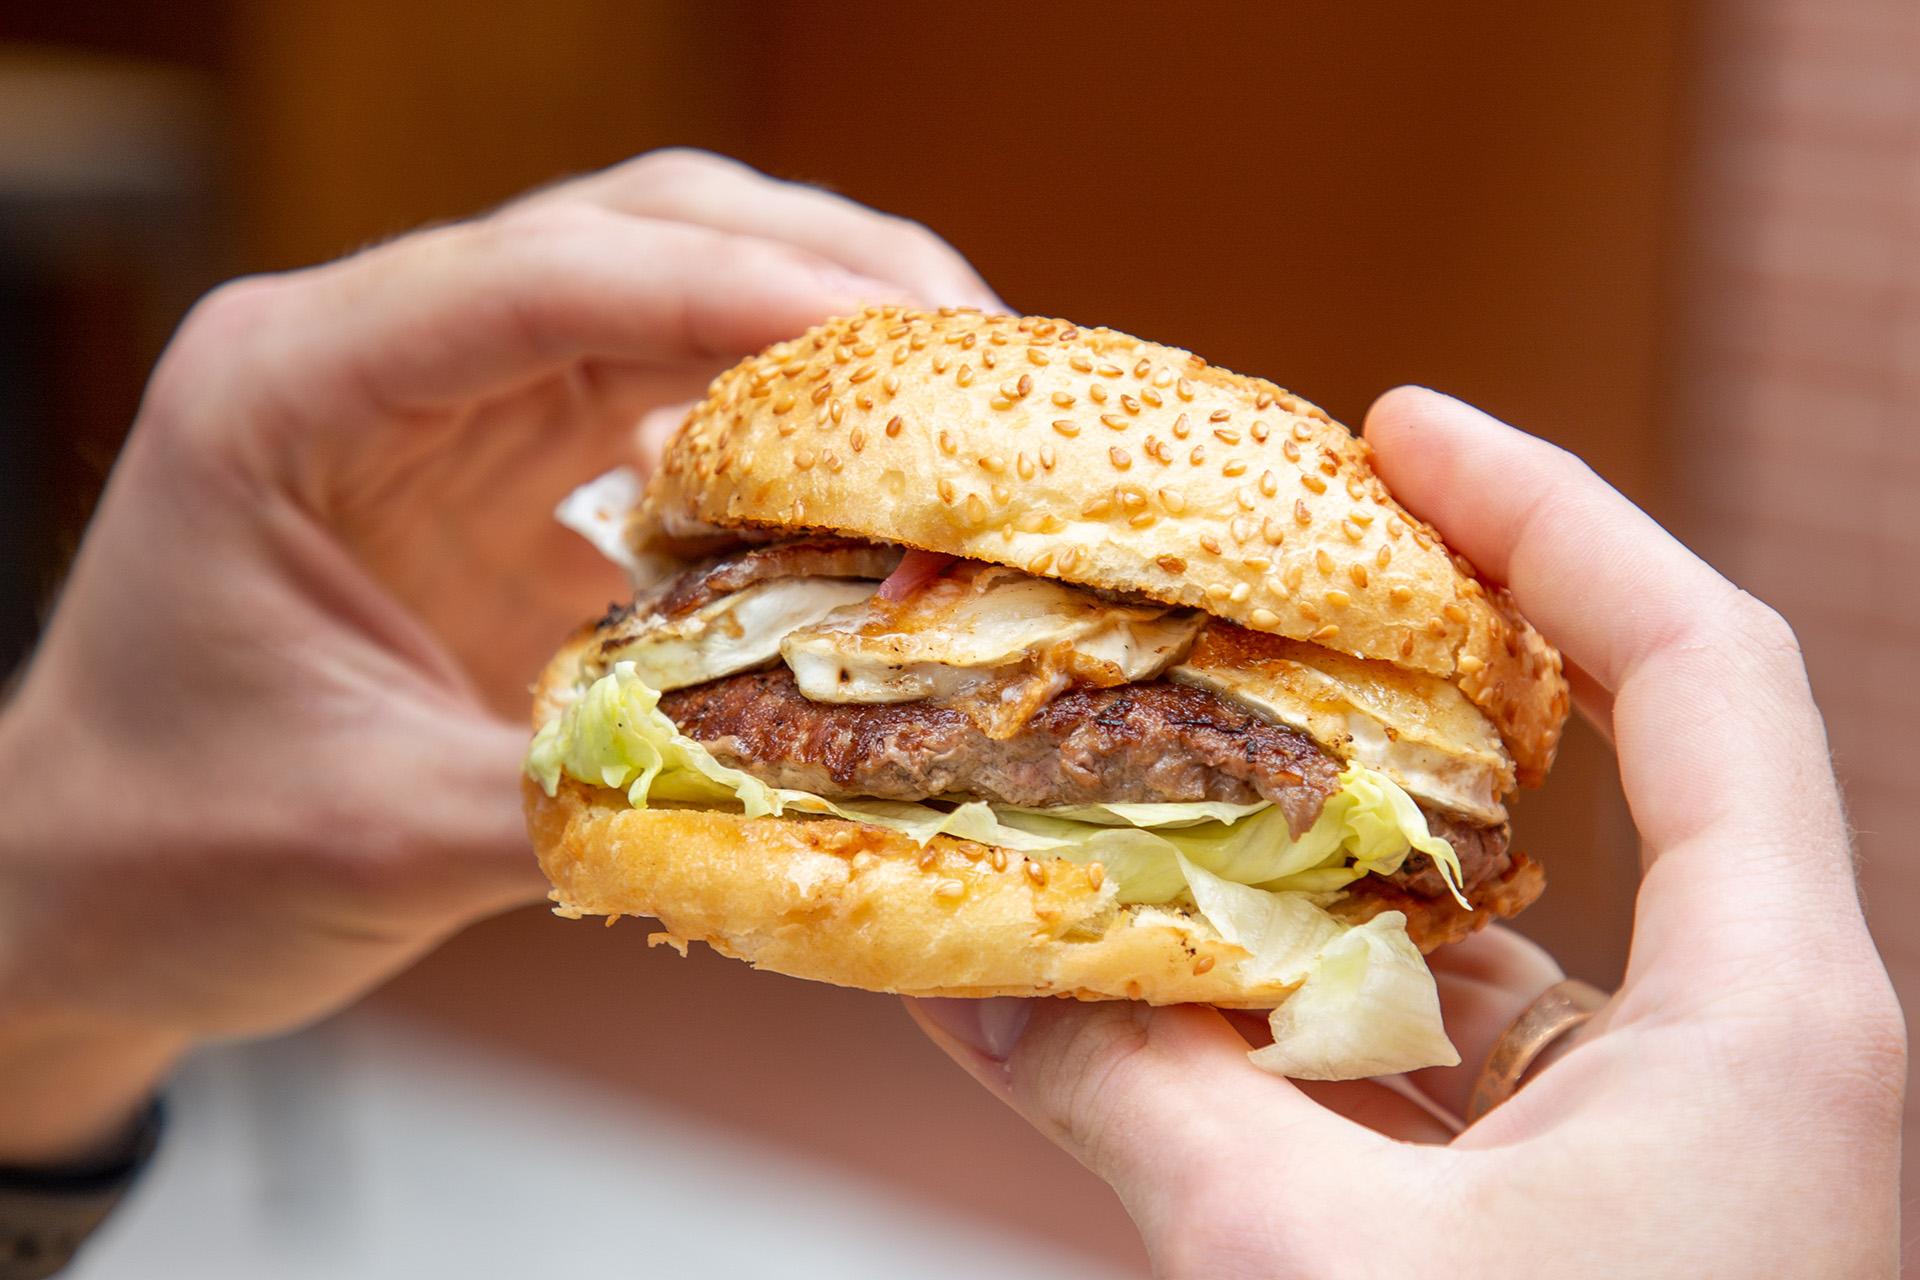 duck me restaurant canard capitole burger pur ducker